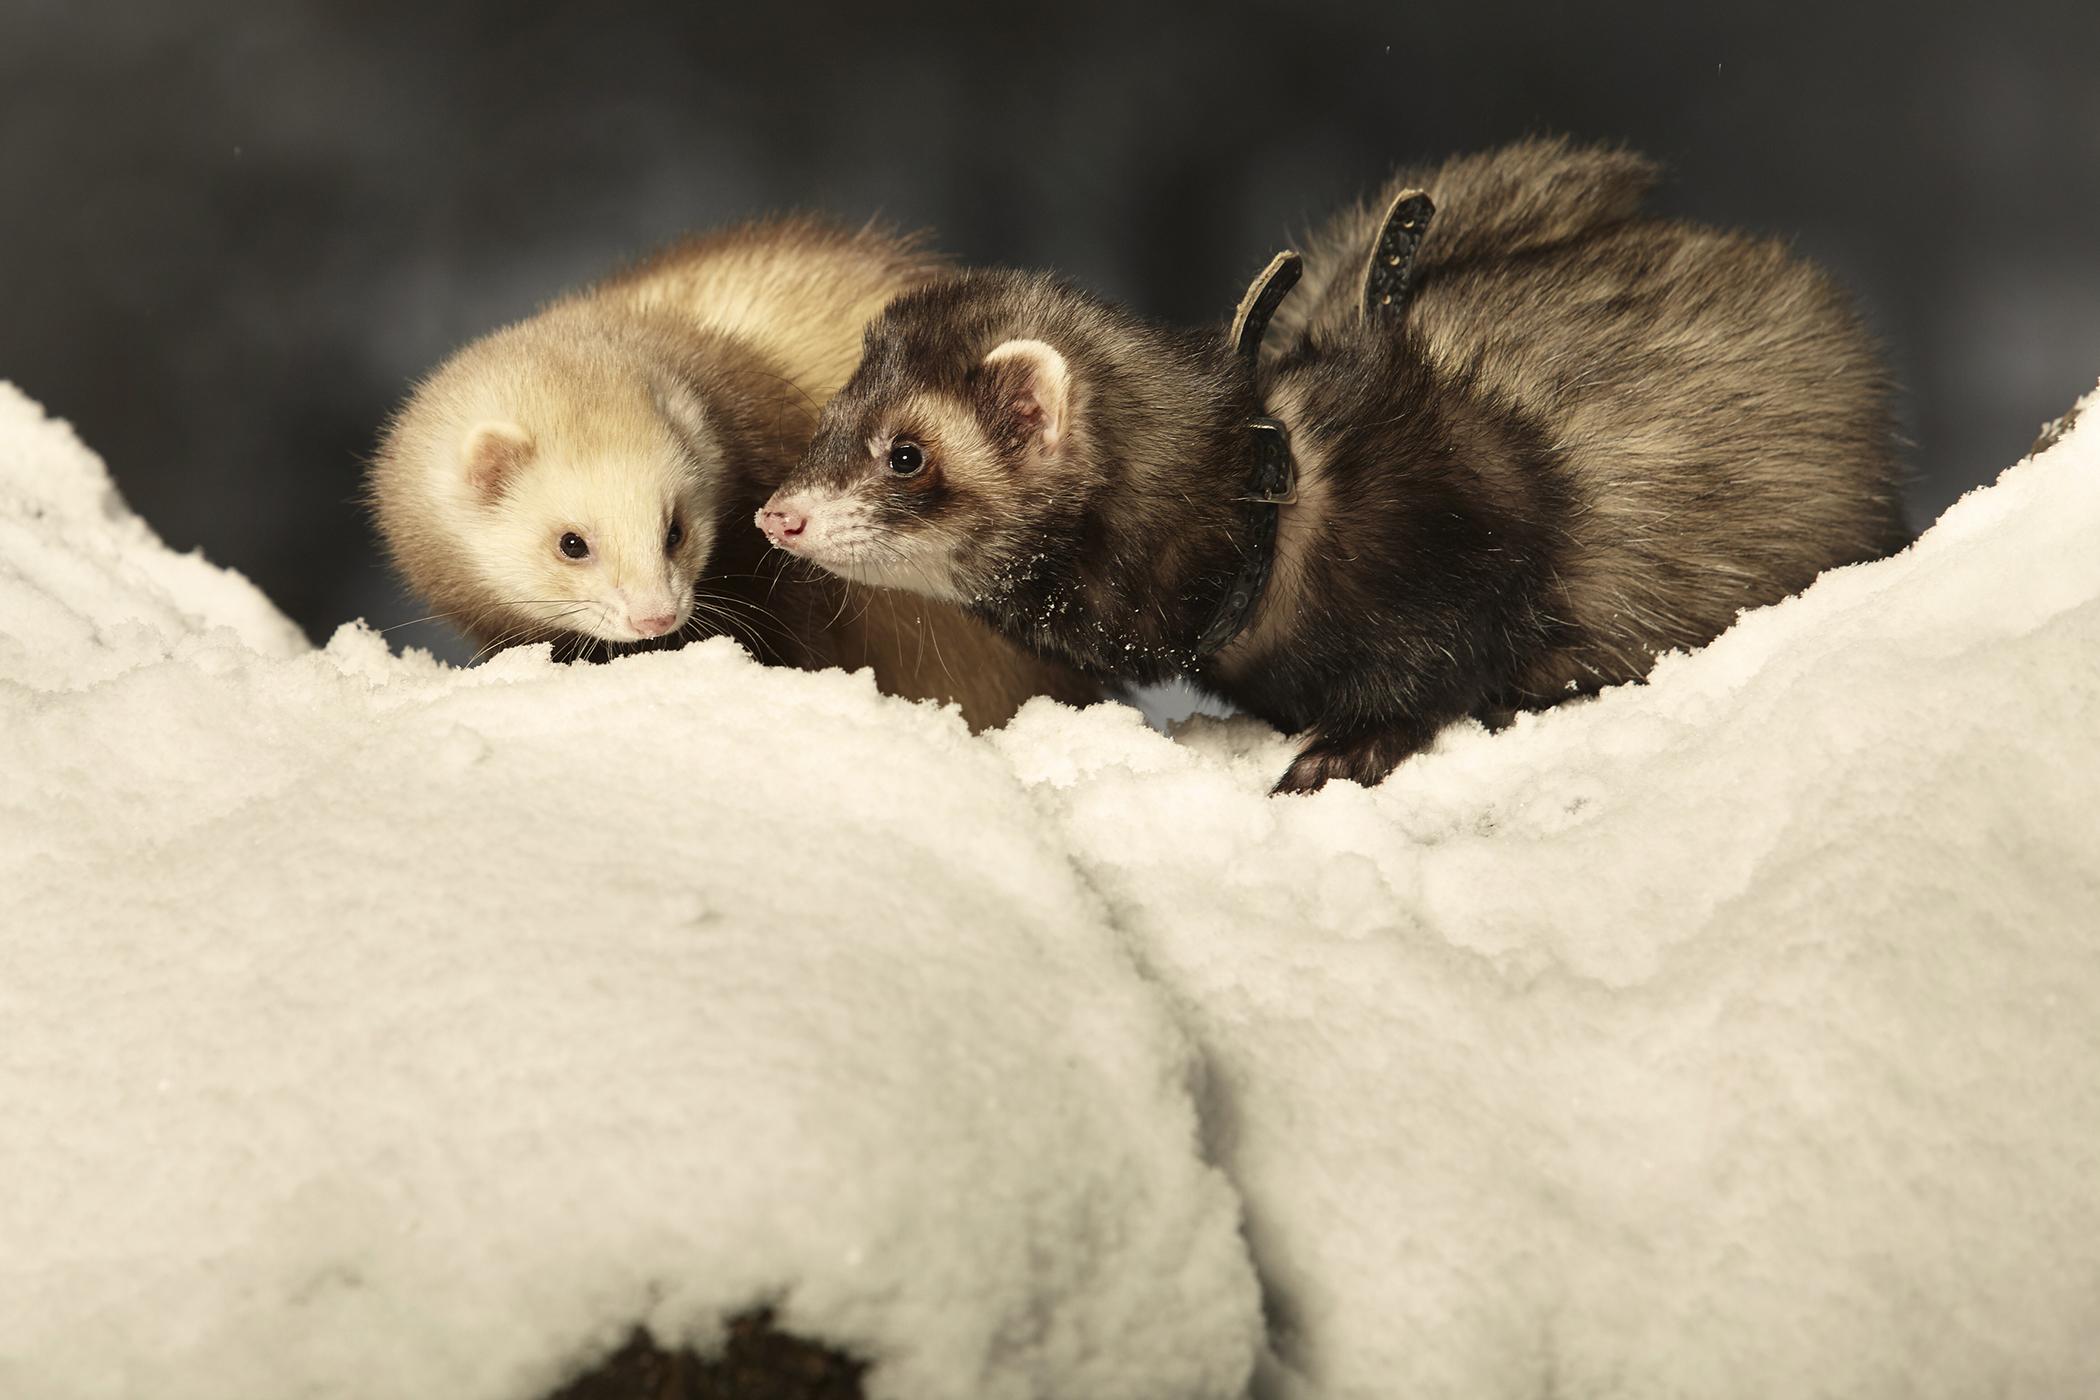 Aspiration Pneumonia in Ferrets